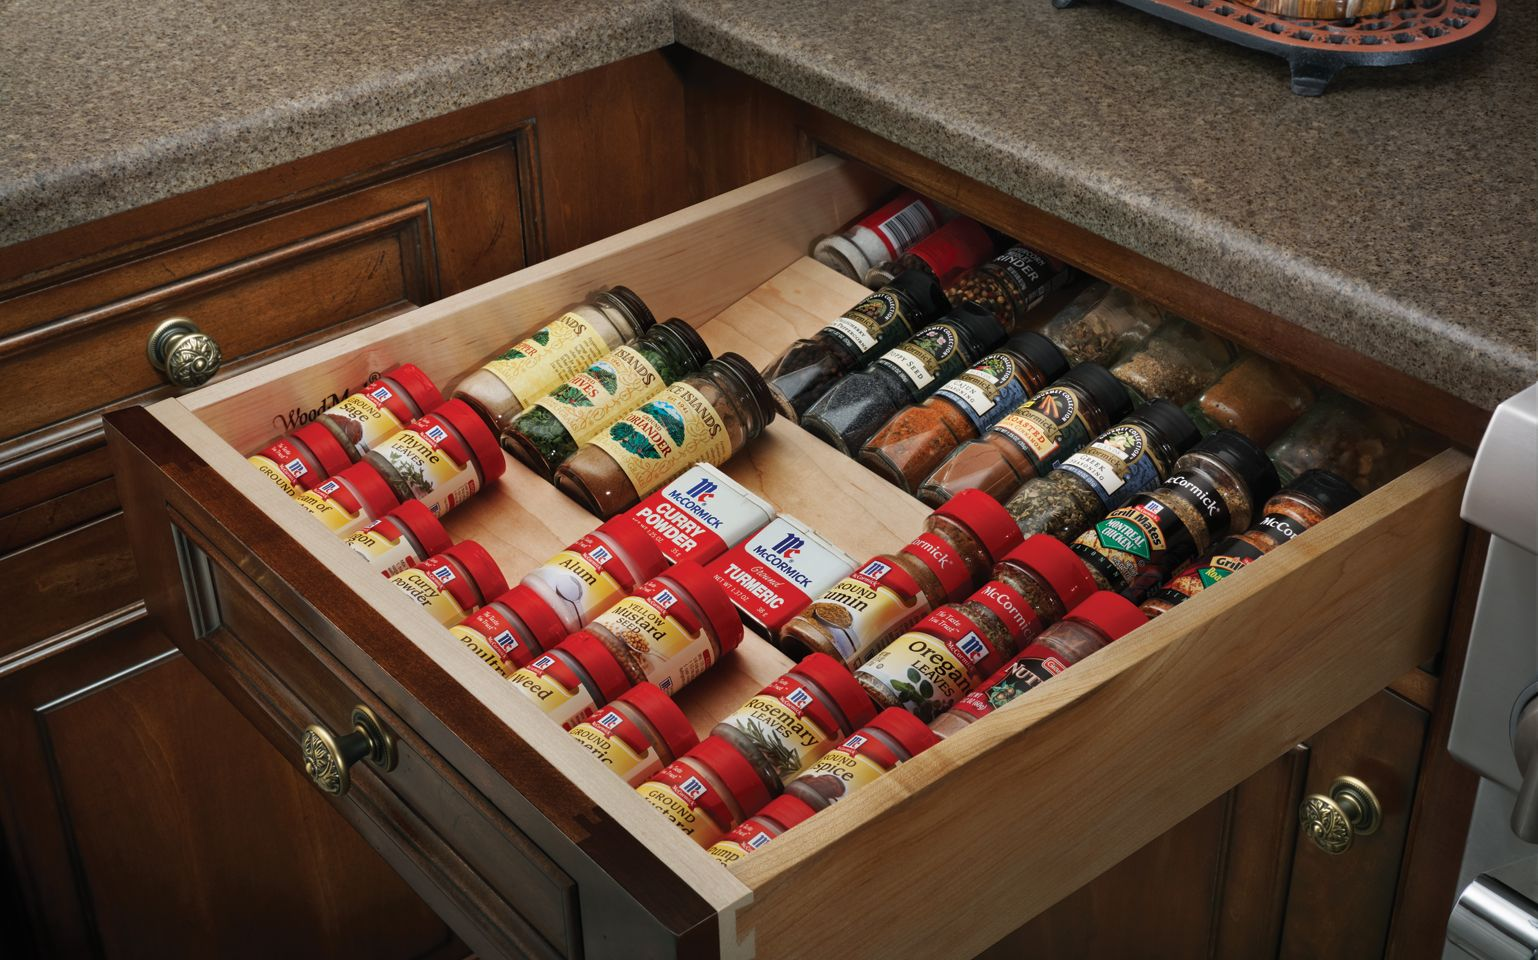 Spice Drawer Insert Wood Mode Fine Custom Cabinetry Kitchen Cabinet Storage Kitchen Cabinets Storage Organizers Spice Storage Drawer